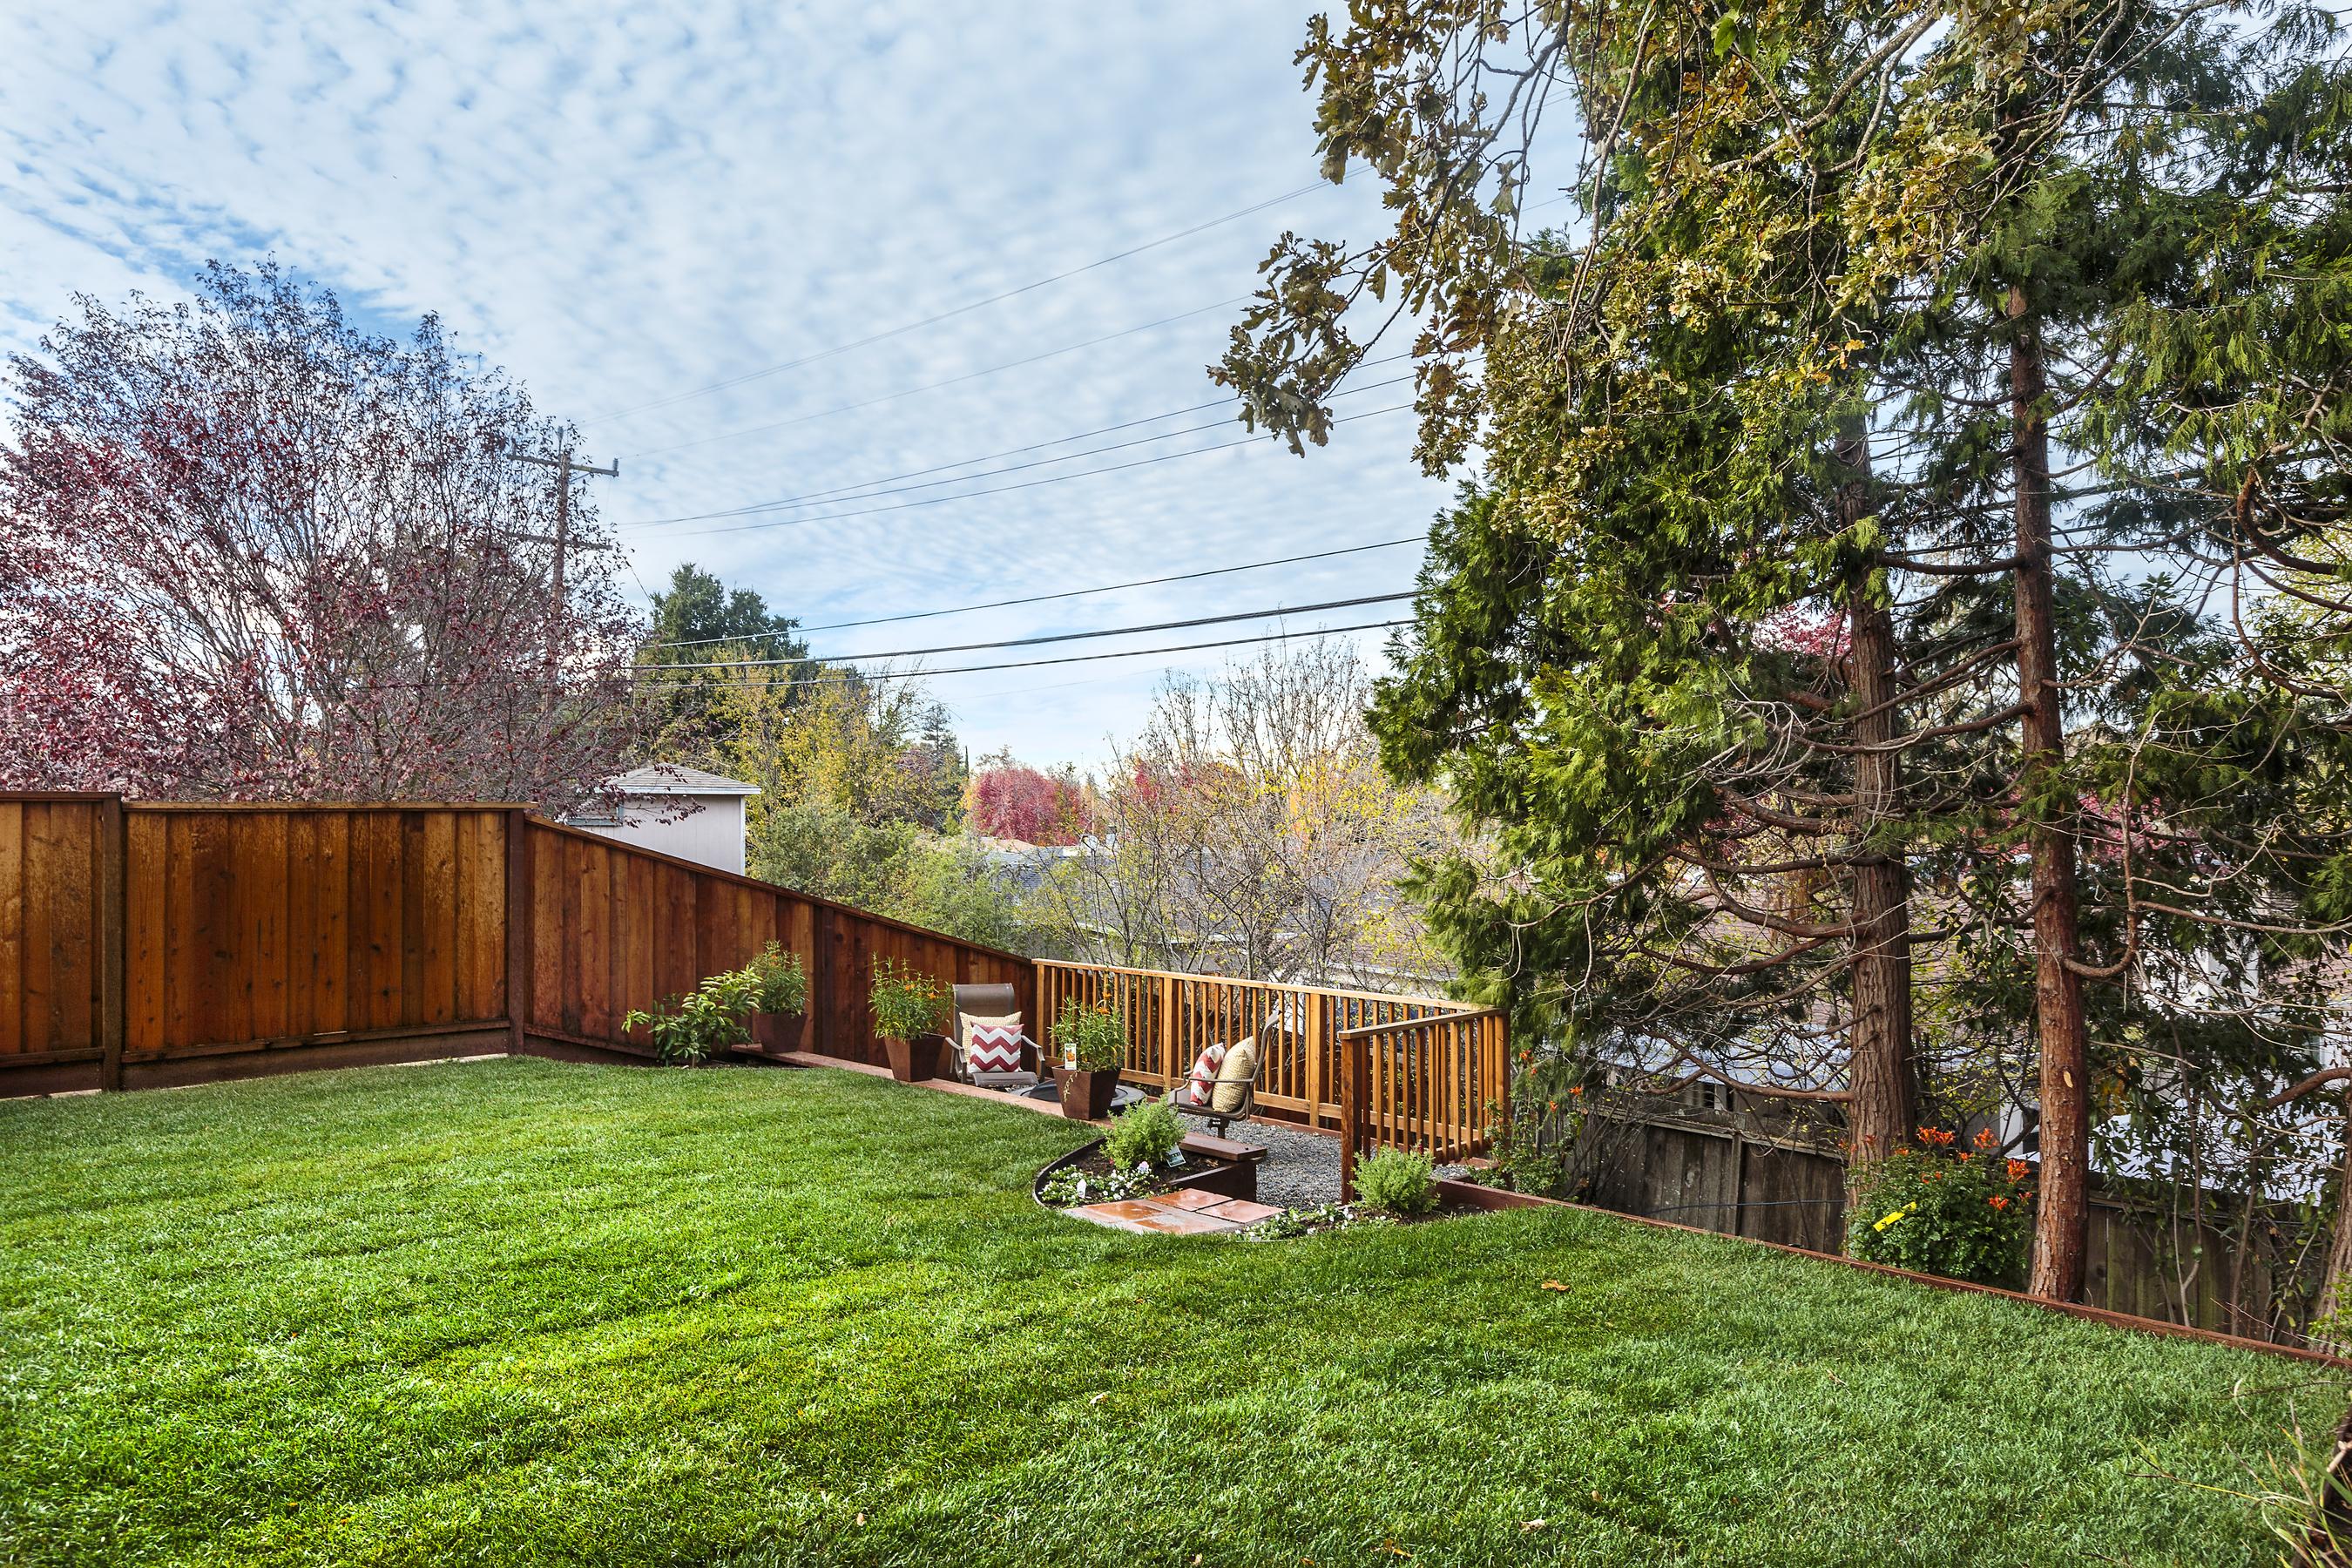 17-1771Maryland-backyard-high-res